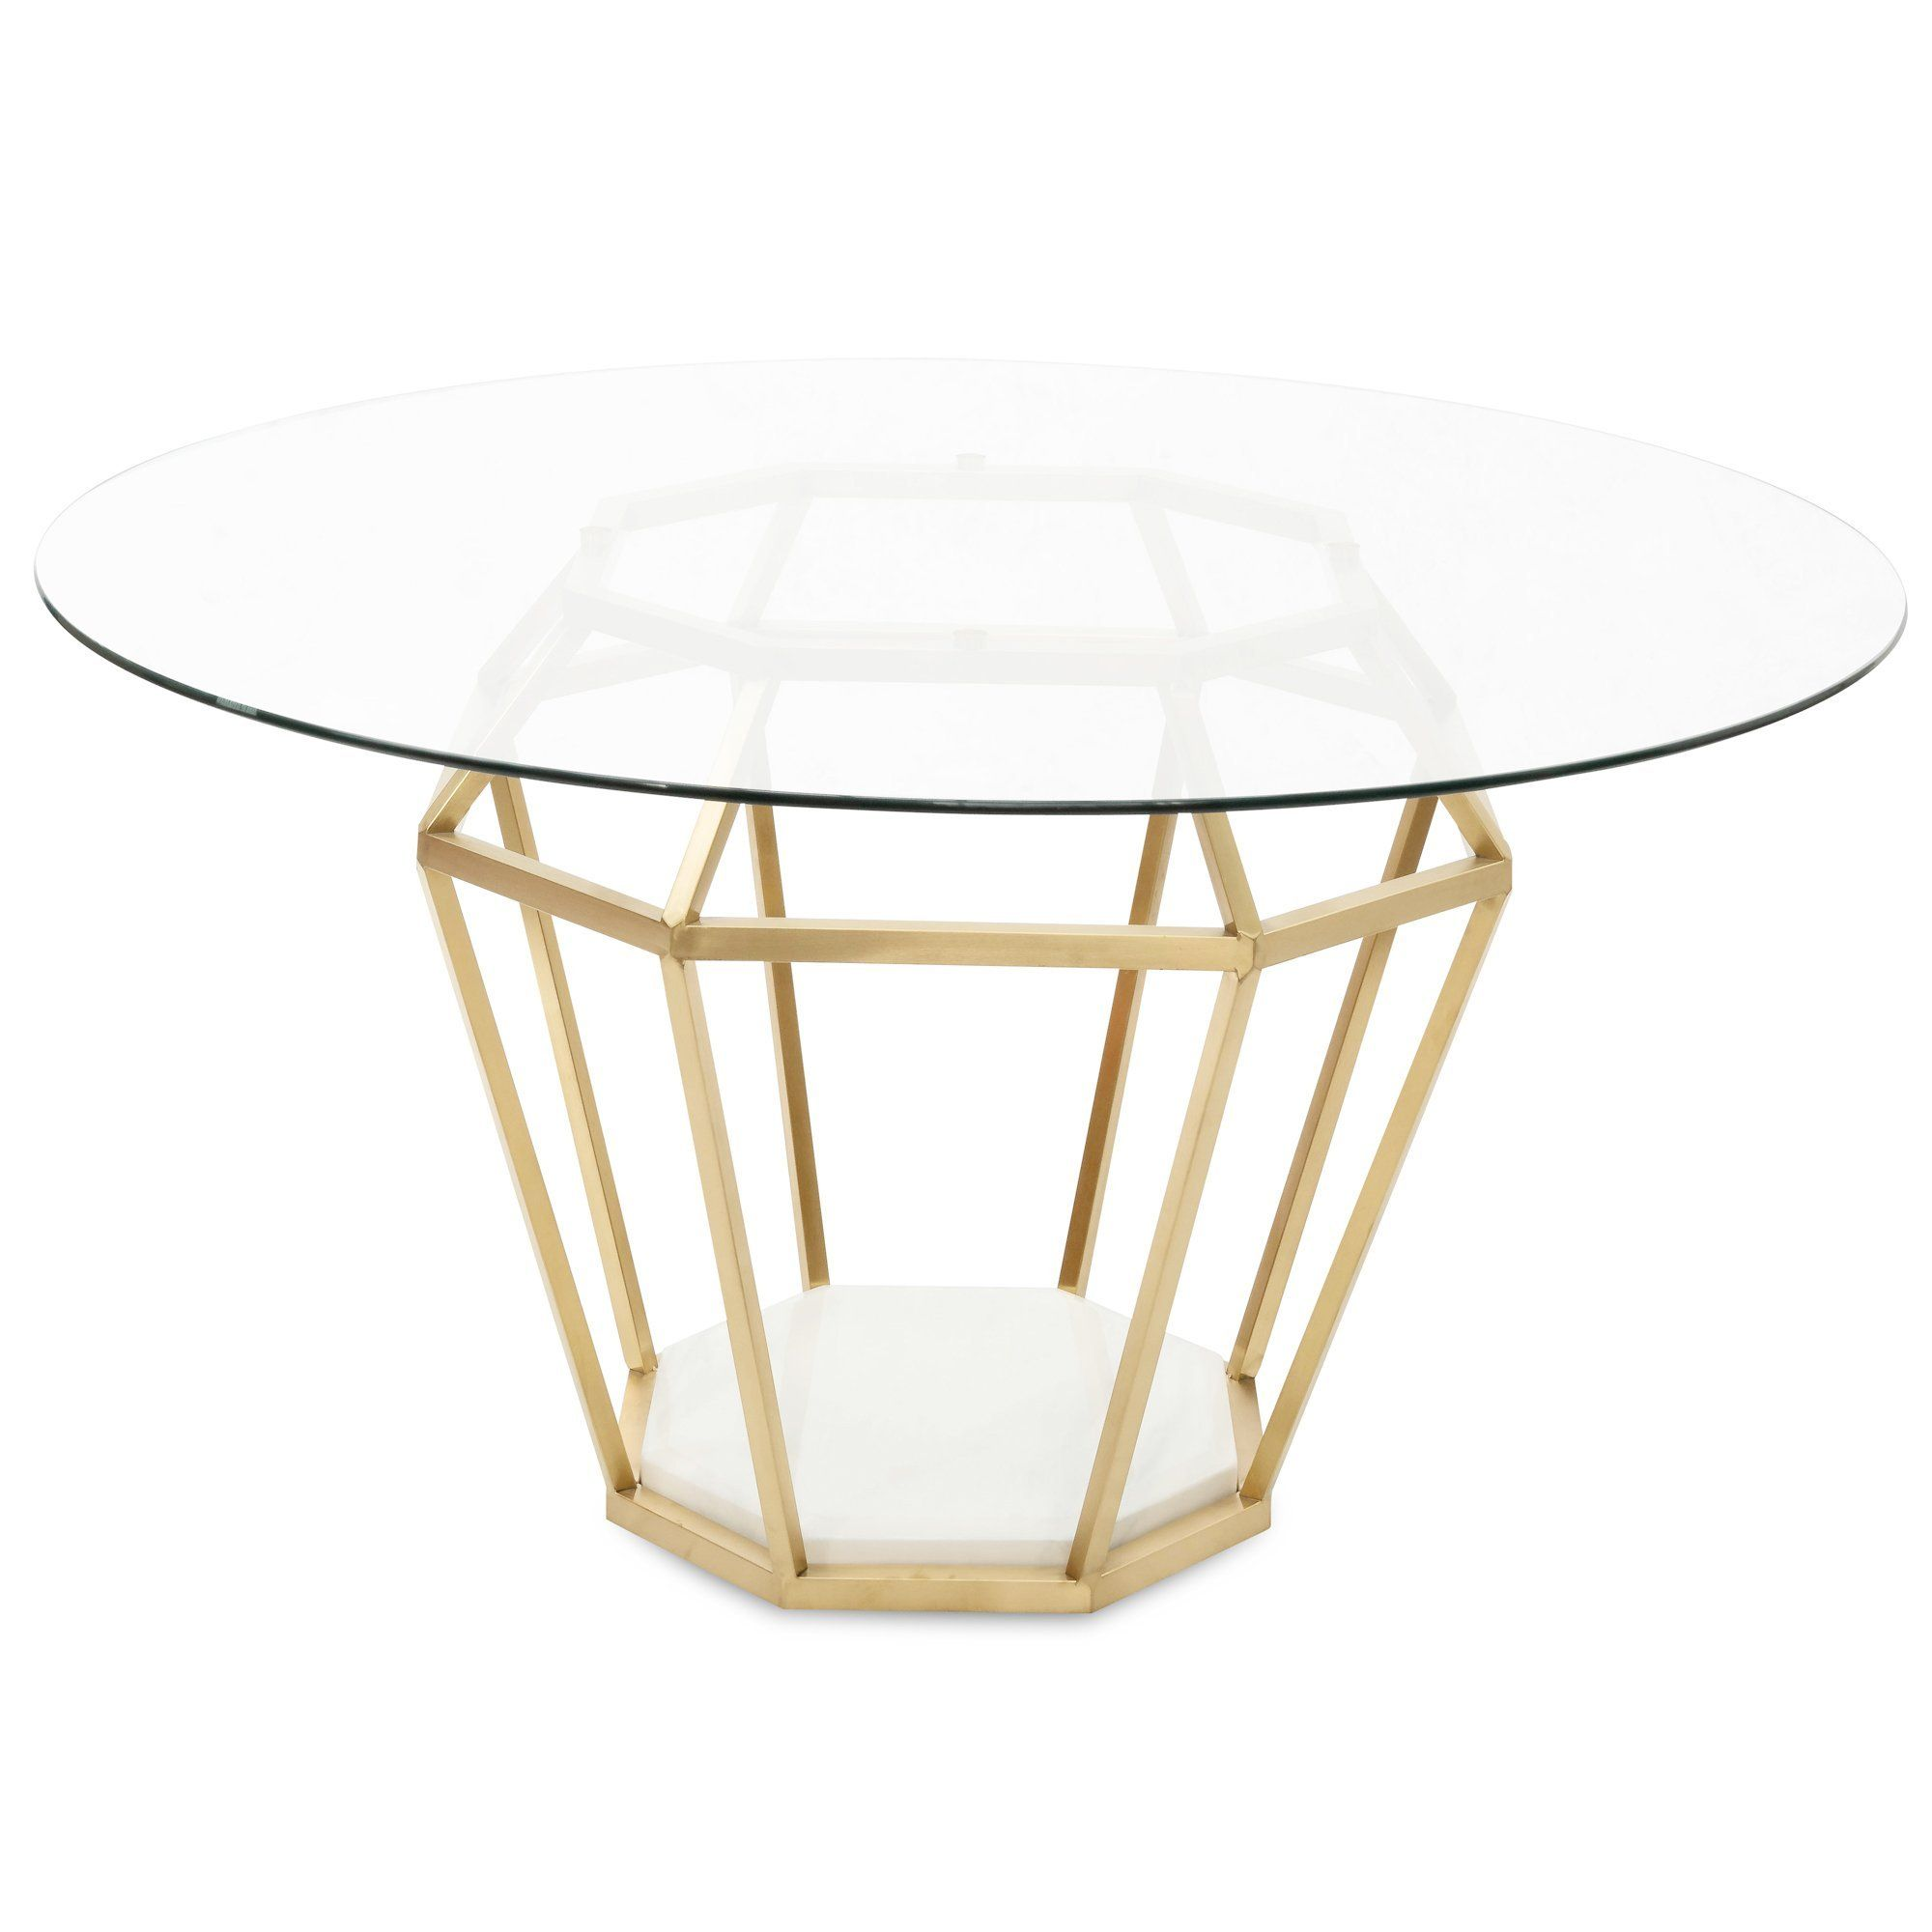 Noosa 1 4m Diameter Round Dining Table Brushed Gold Base Round